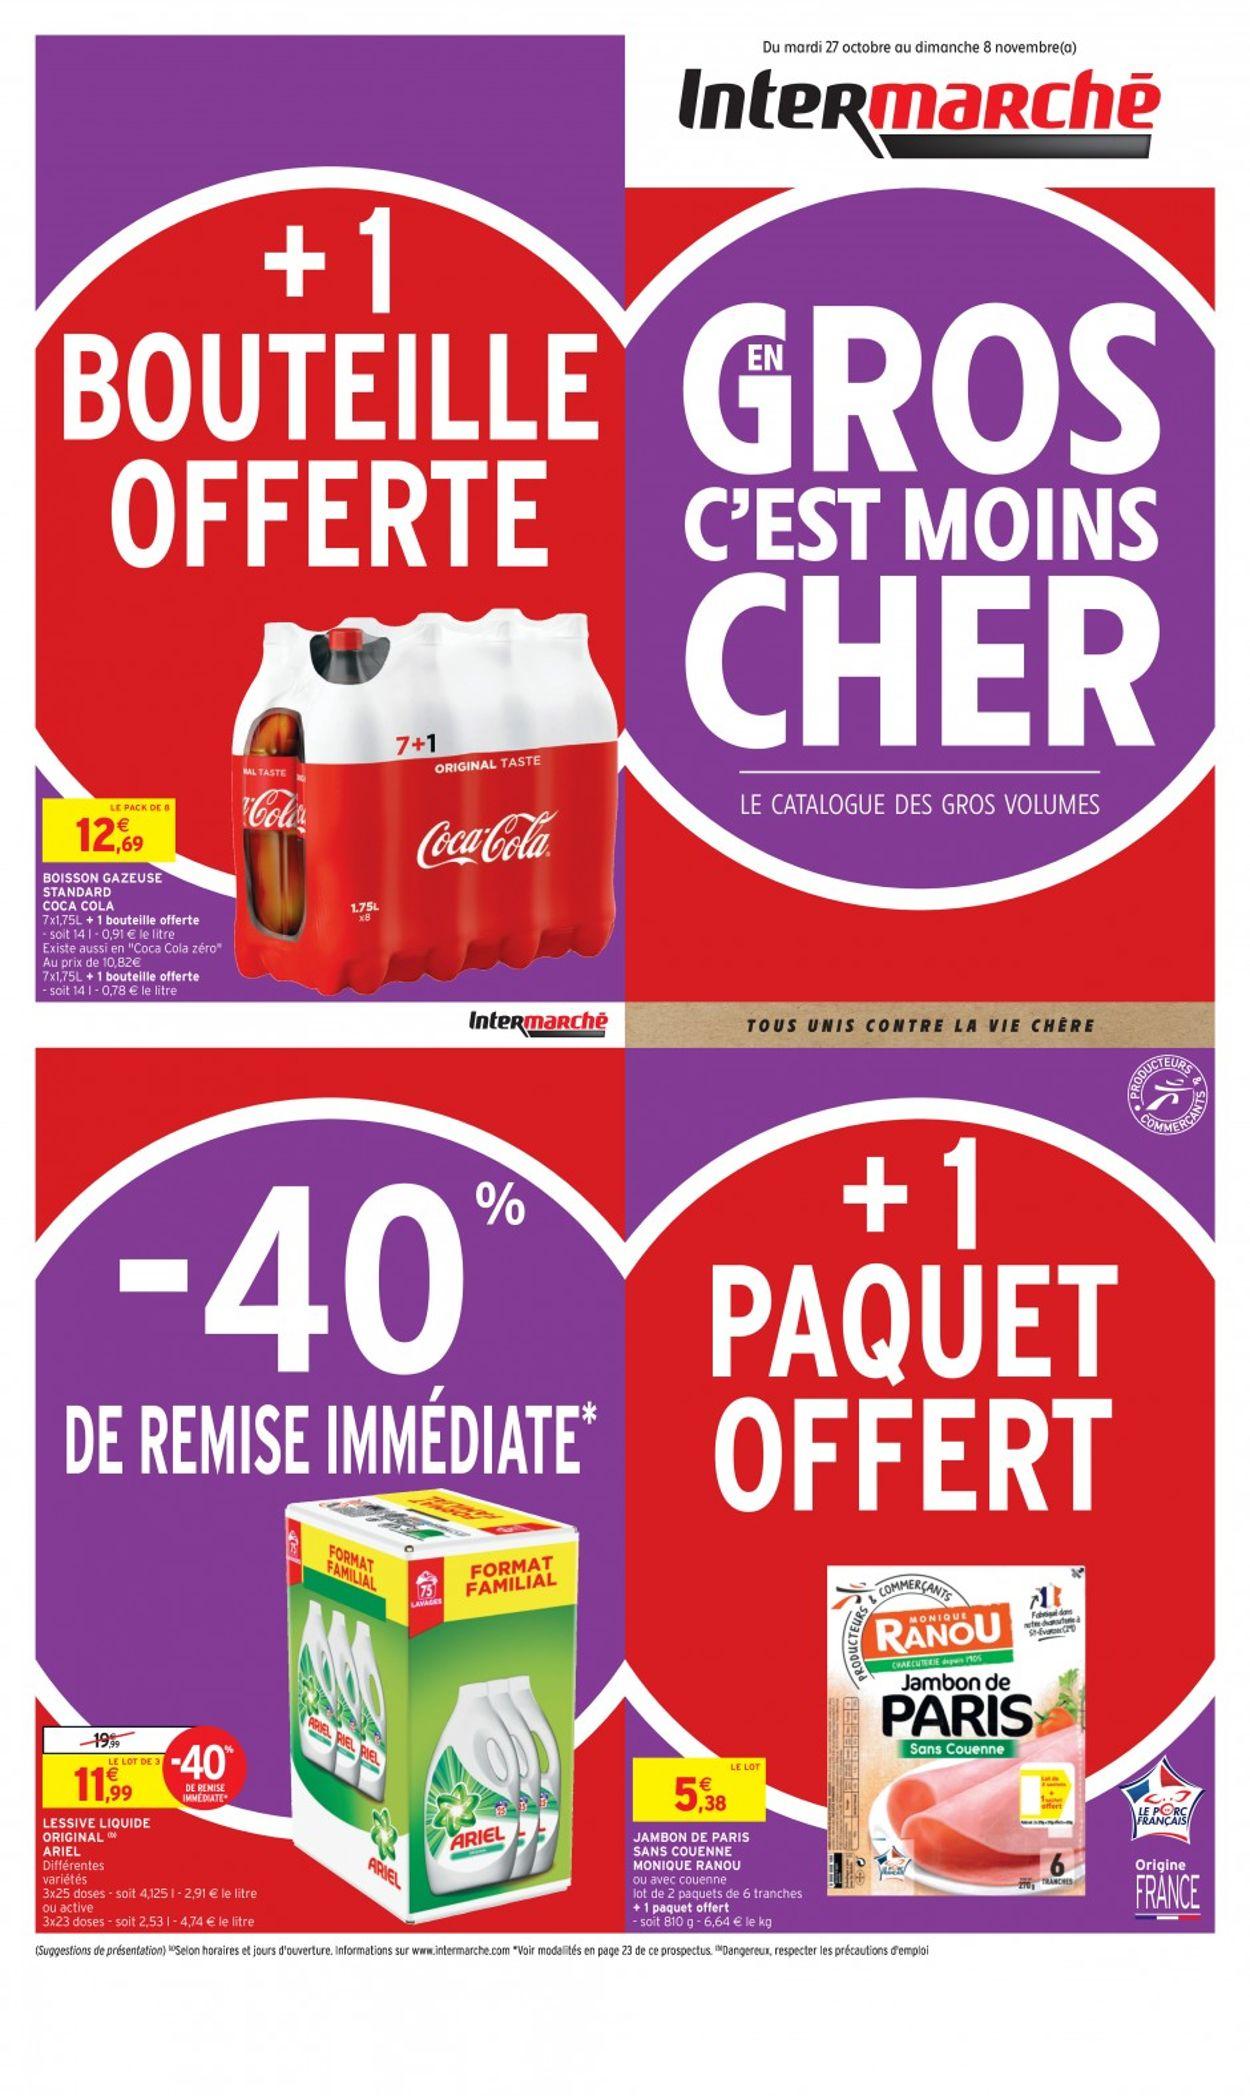 Intermarché Catalogue - 27.10-08.11.2020